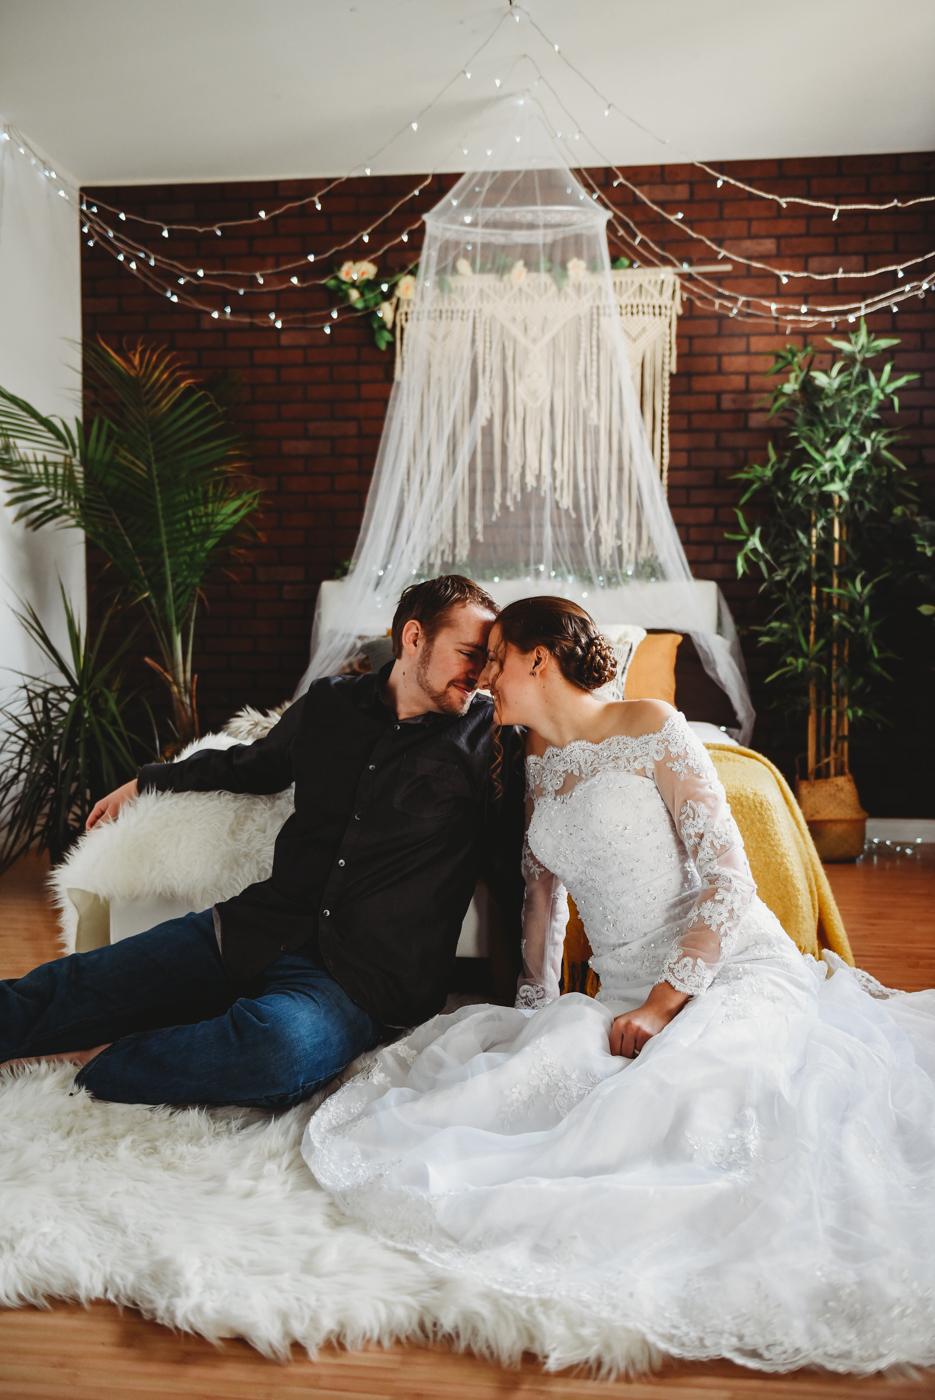 FortSt.John_photographer_TyraEPhotography_Wedding_Couple_Family_Photograhy_DawsonCreek_Elopement_Bride_Boduoir_Portraits-1.jpg